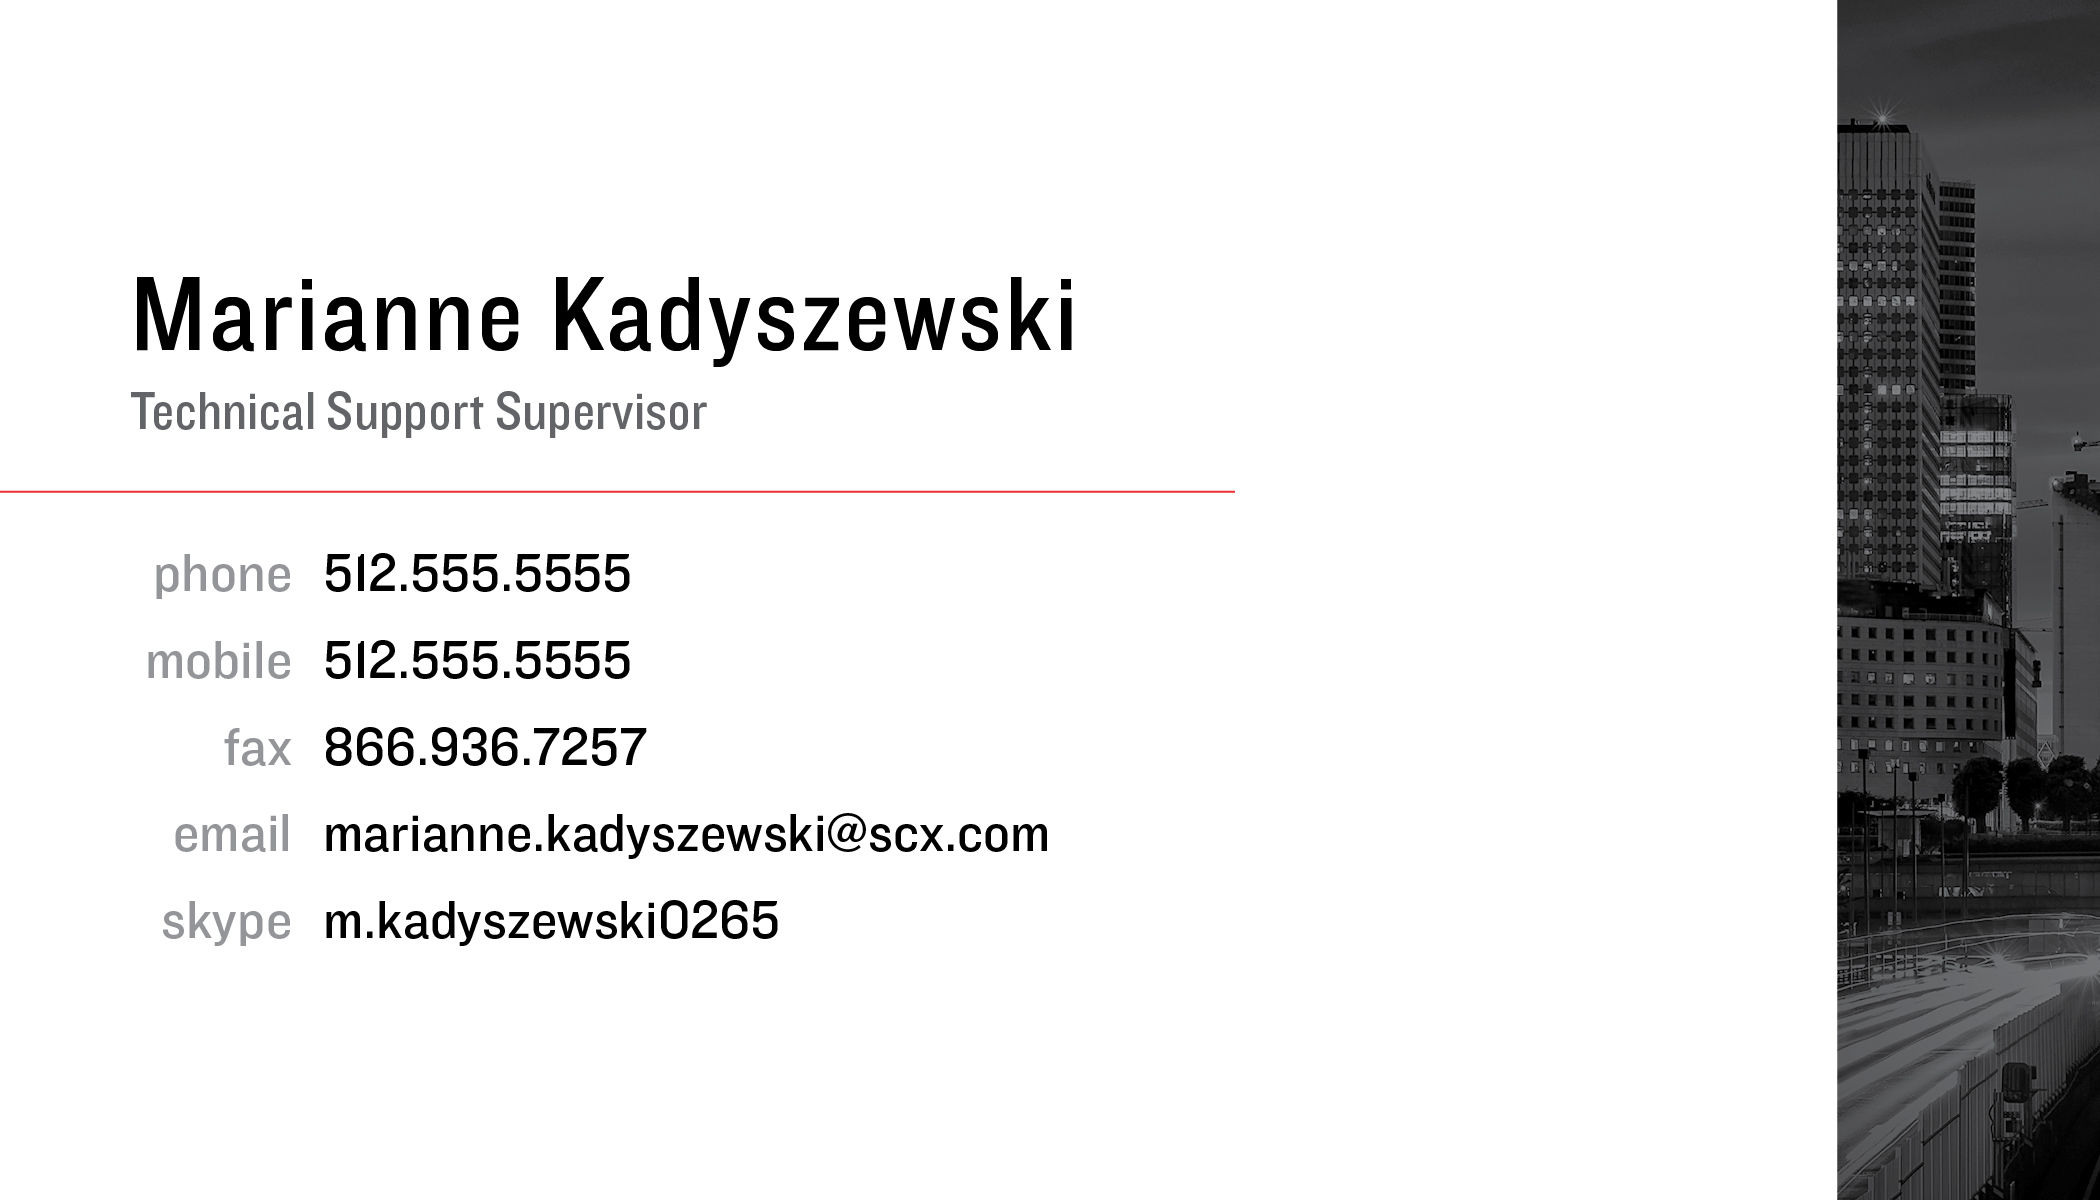 SC business card design concepts9.jpg